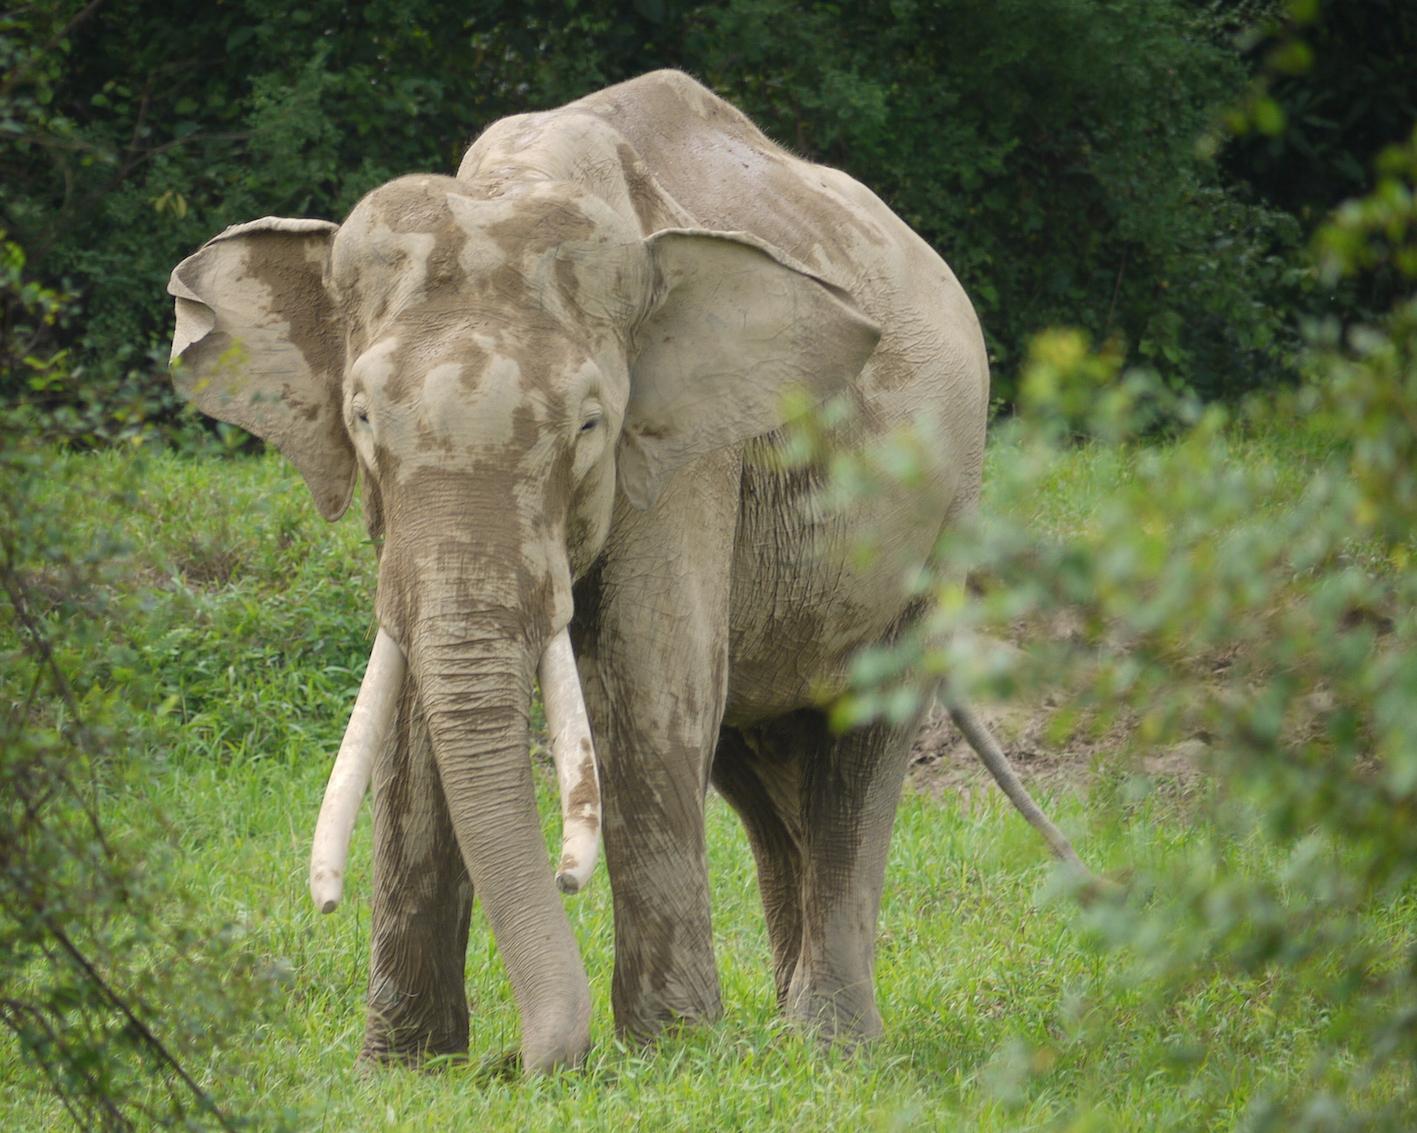 A Sumatran Elephant feeding on grass verging the rainforest  (photo by William Laurance)